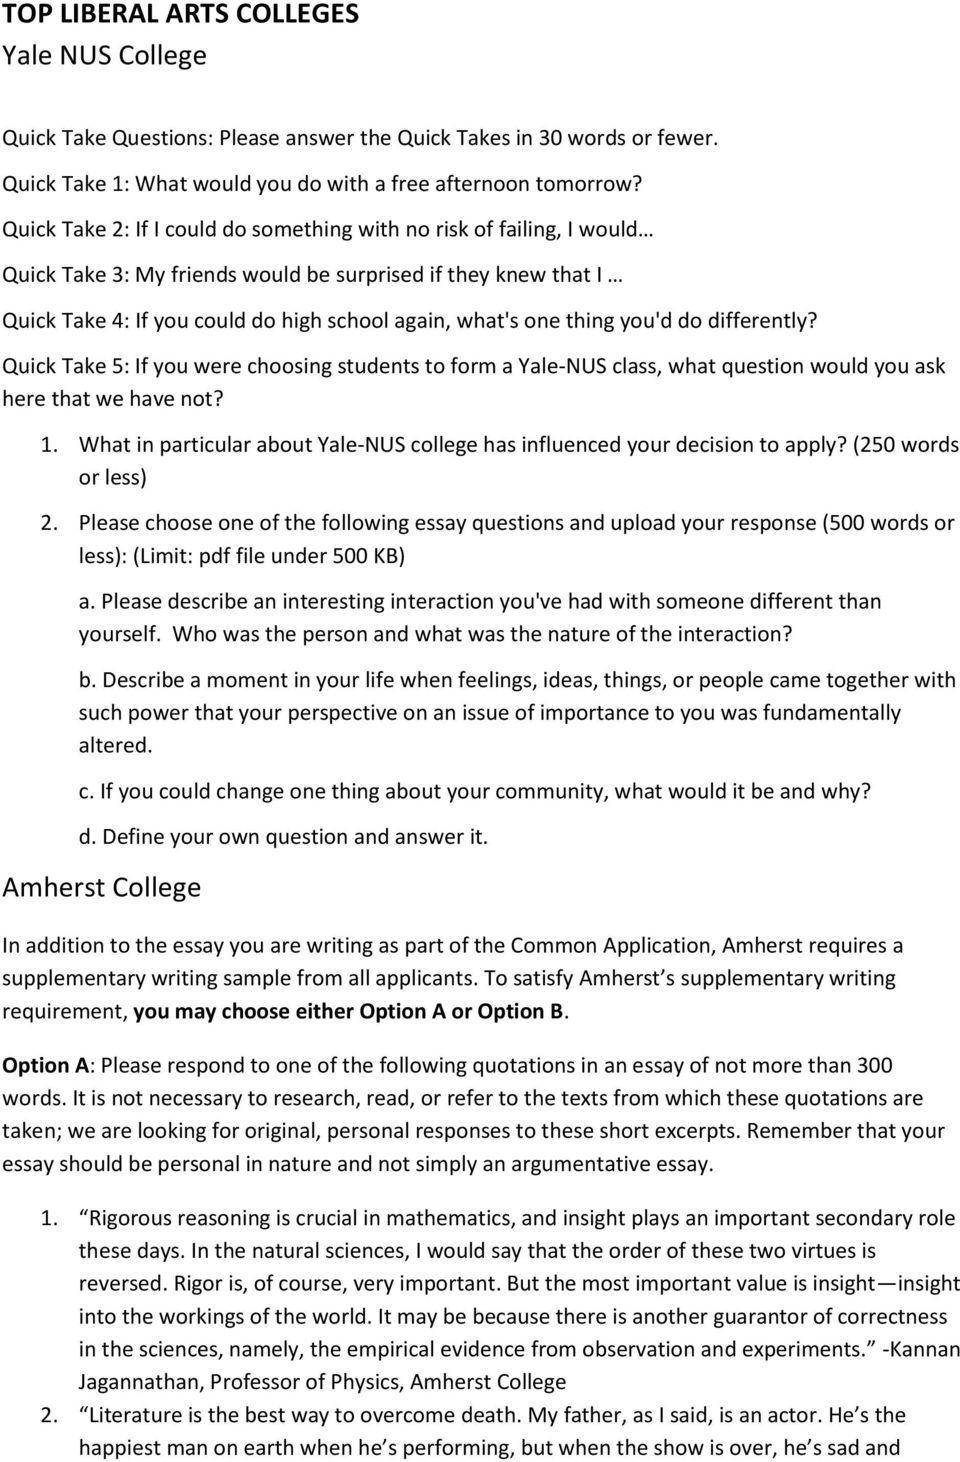 College application essay help online 500 words